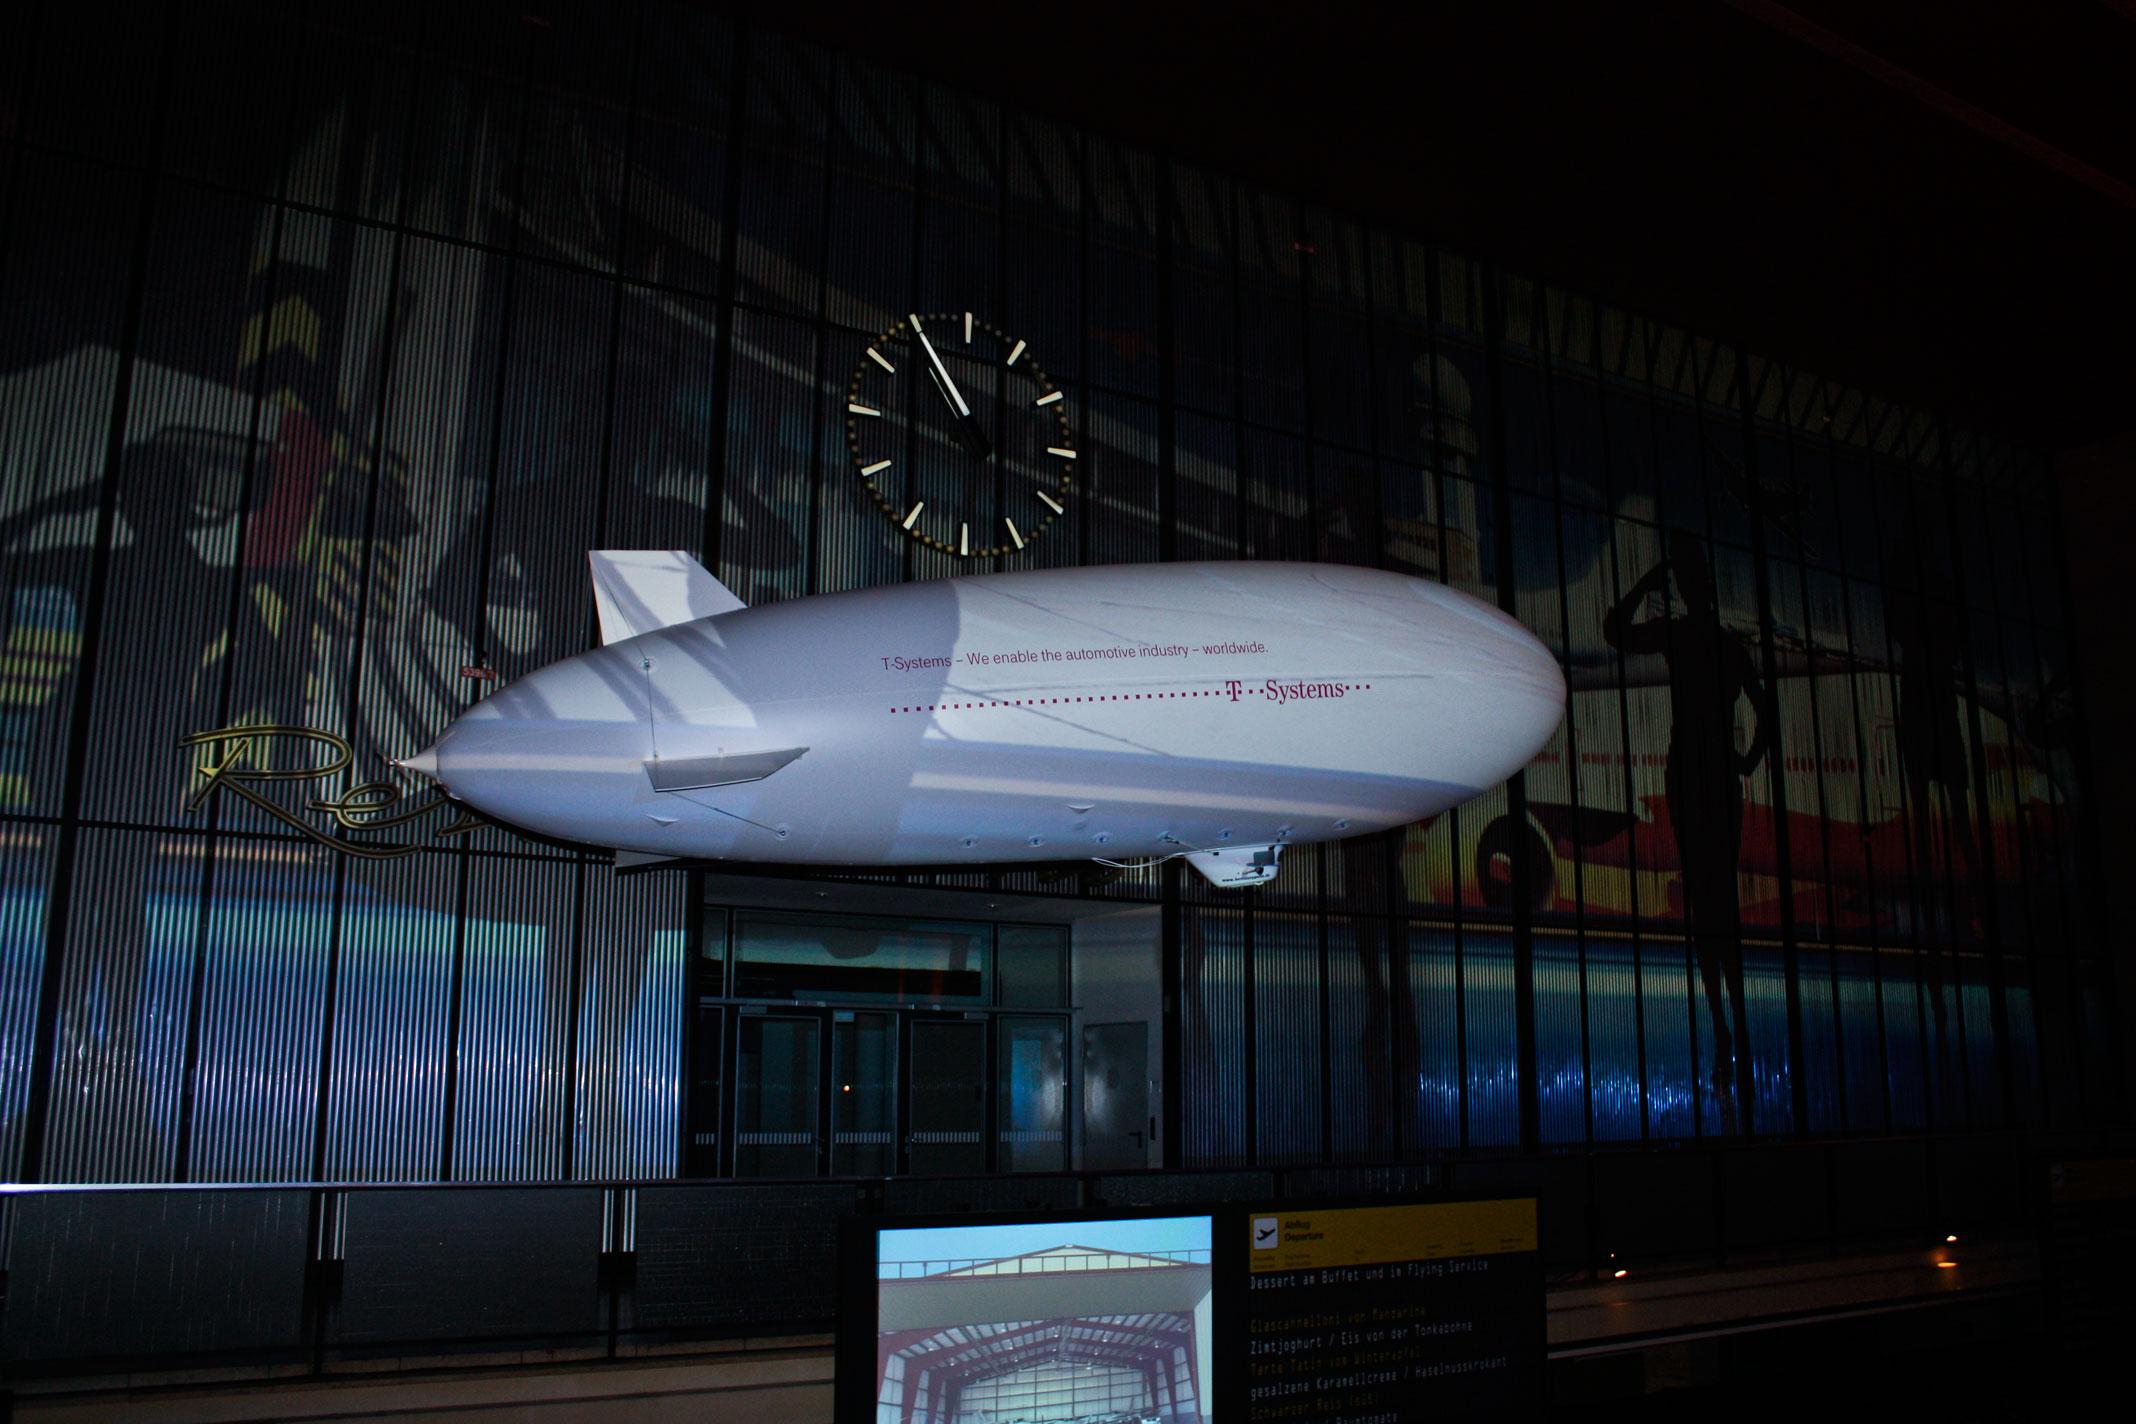 ferngesteuerter-Zeppelin-Flughafen-Tempelhof